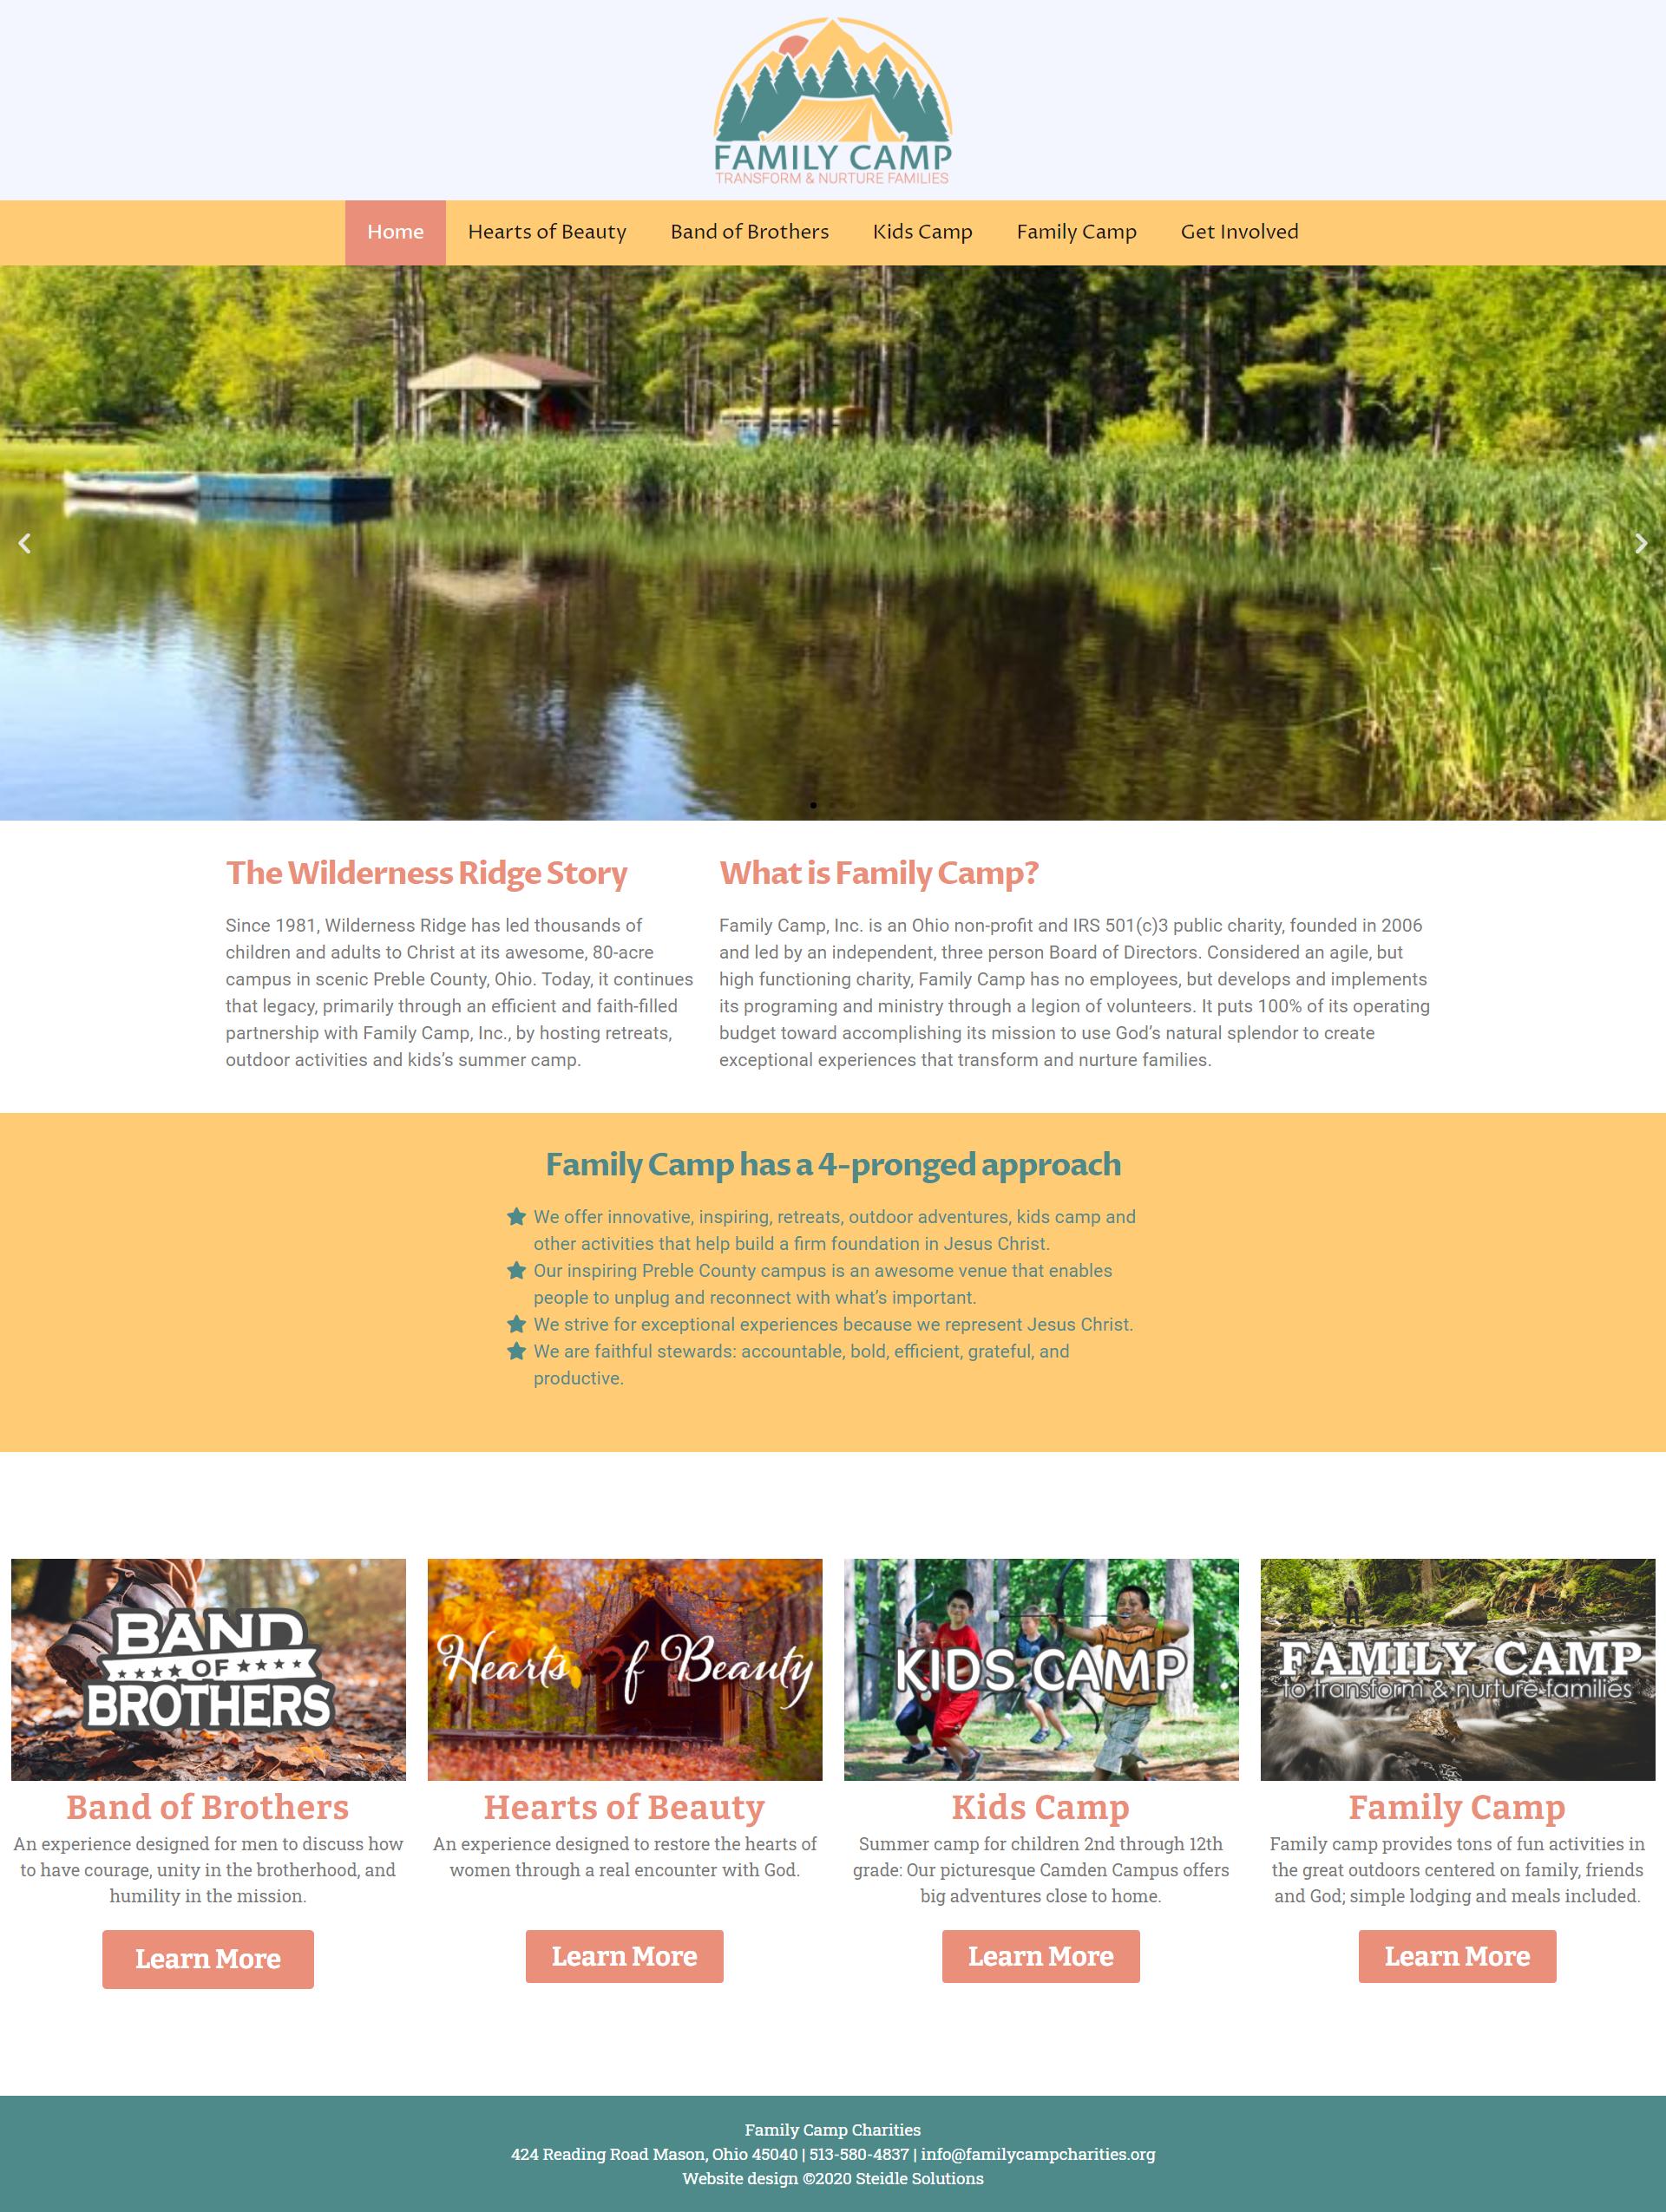 Family Camp Charities Homepage